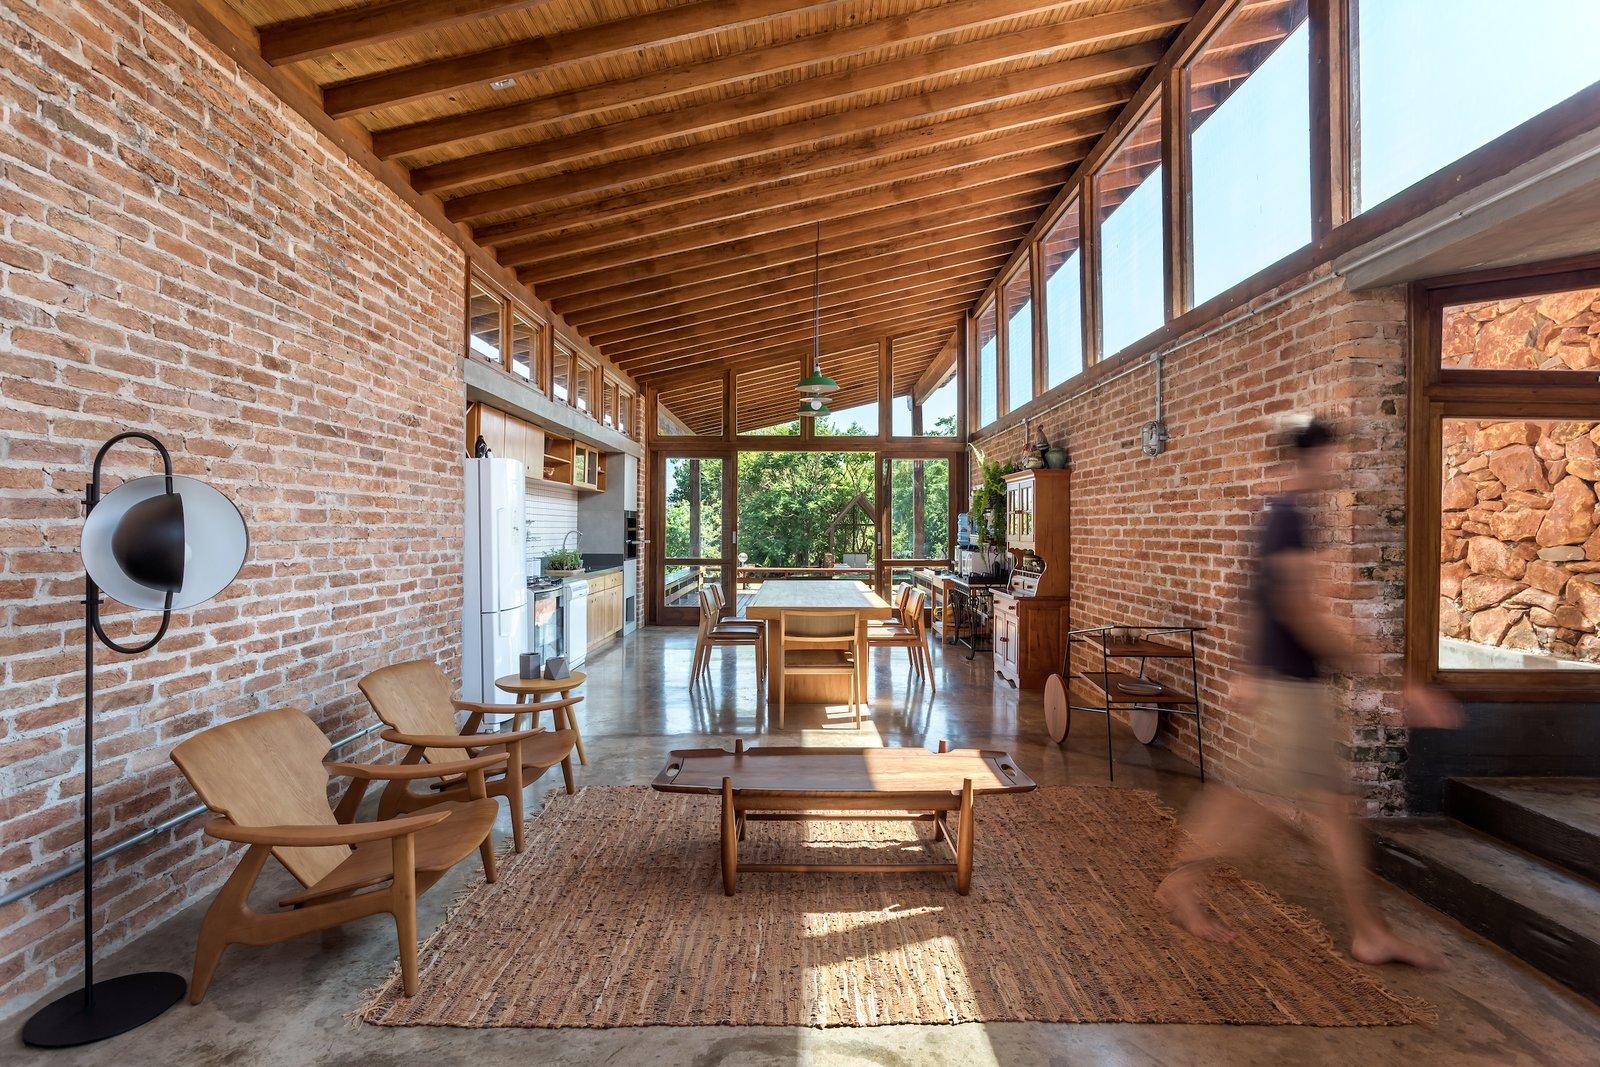 Casa do Lago communal pavilion with clerestory windows